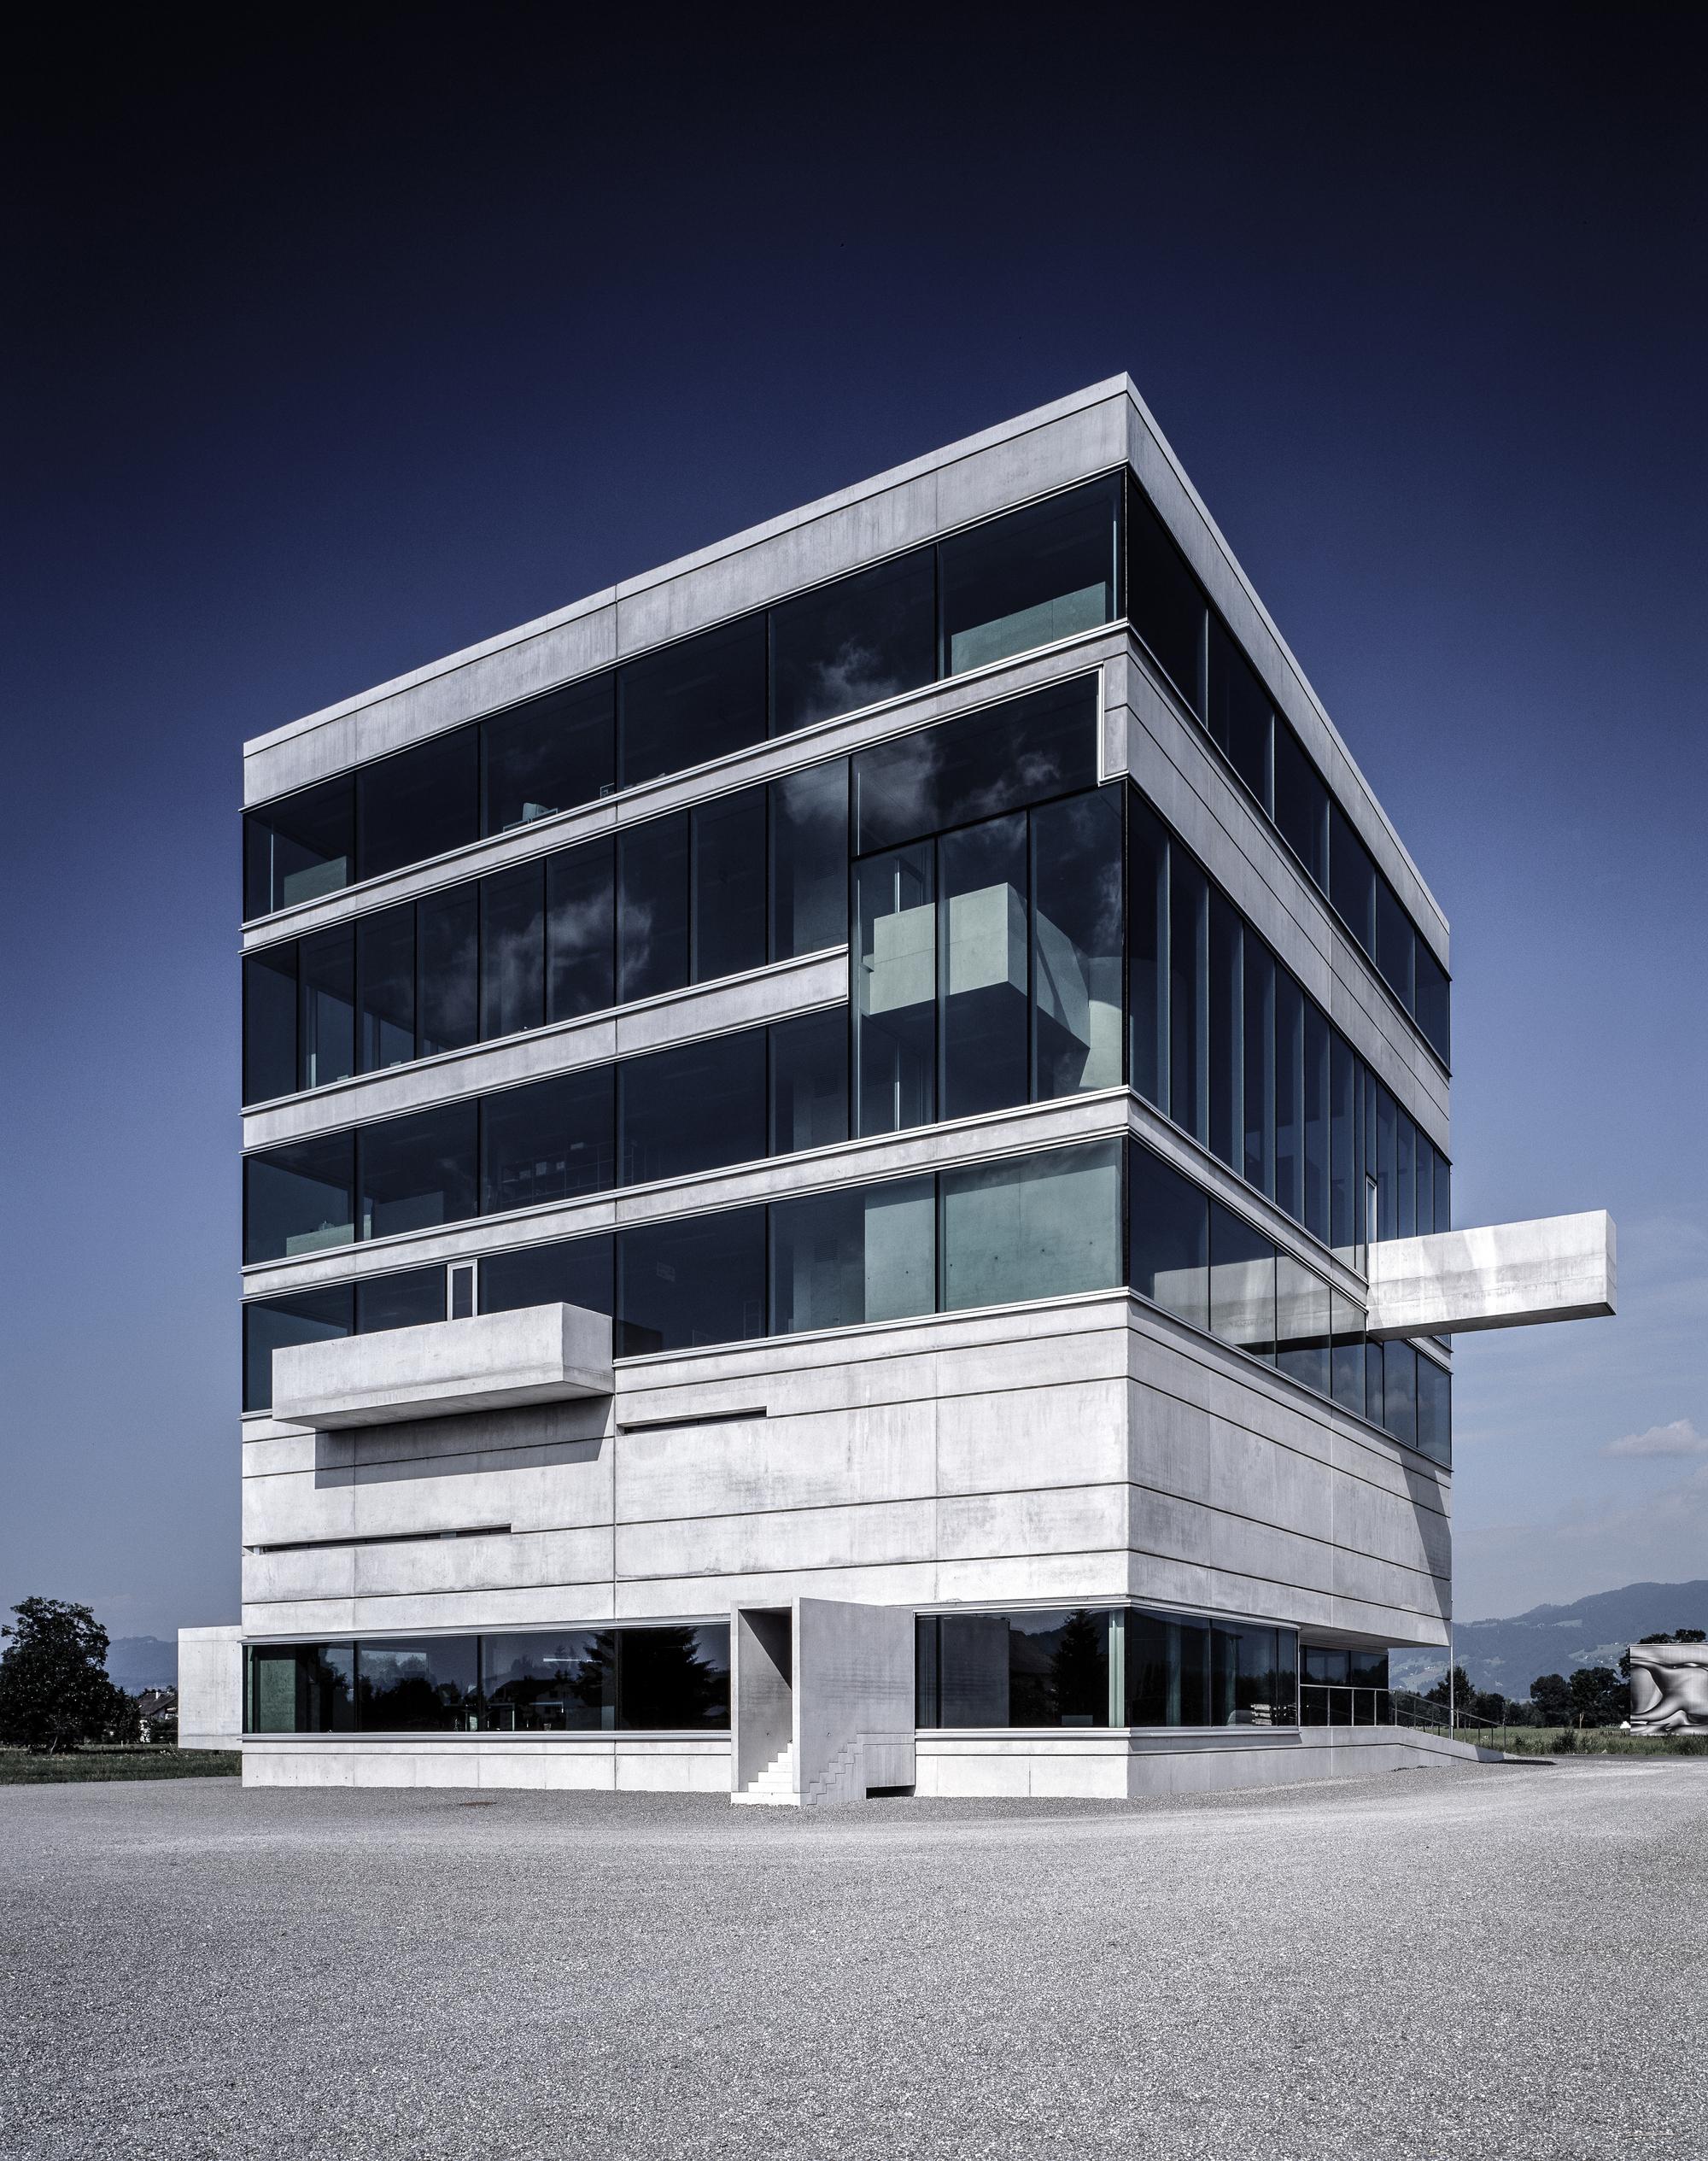 Best Image Headquarter System Industrie Electronic / marte.marte architects